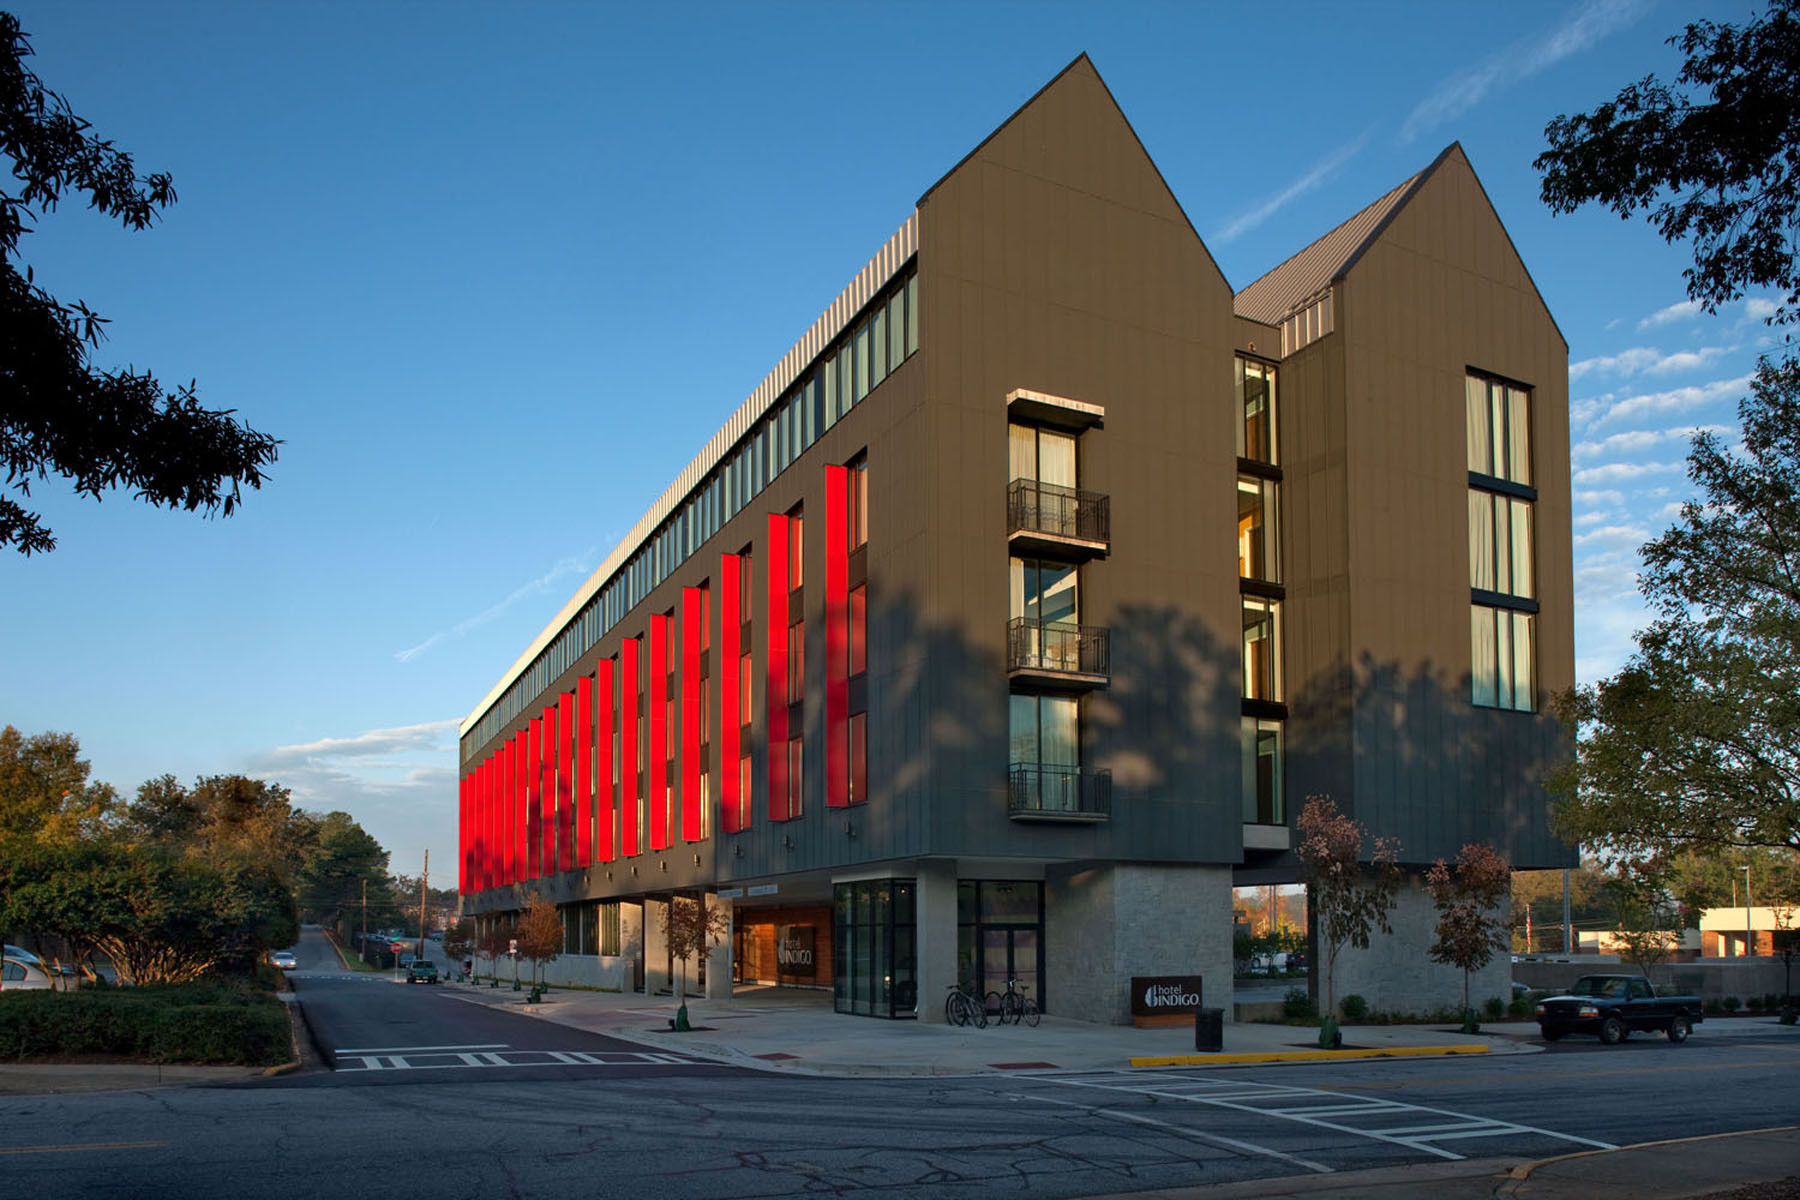 Hotel Indigo / Surber Barber Choate + Hertlein Architects, © Phillip Spears